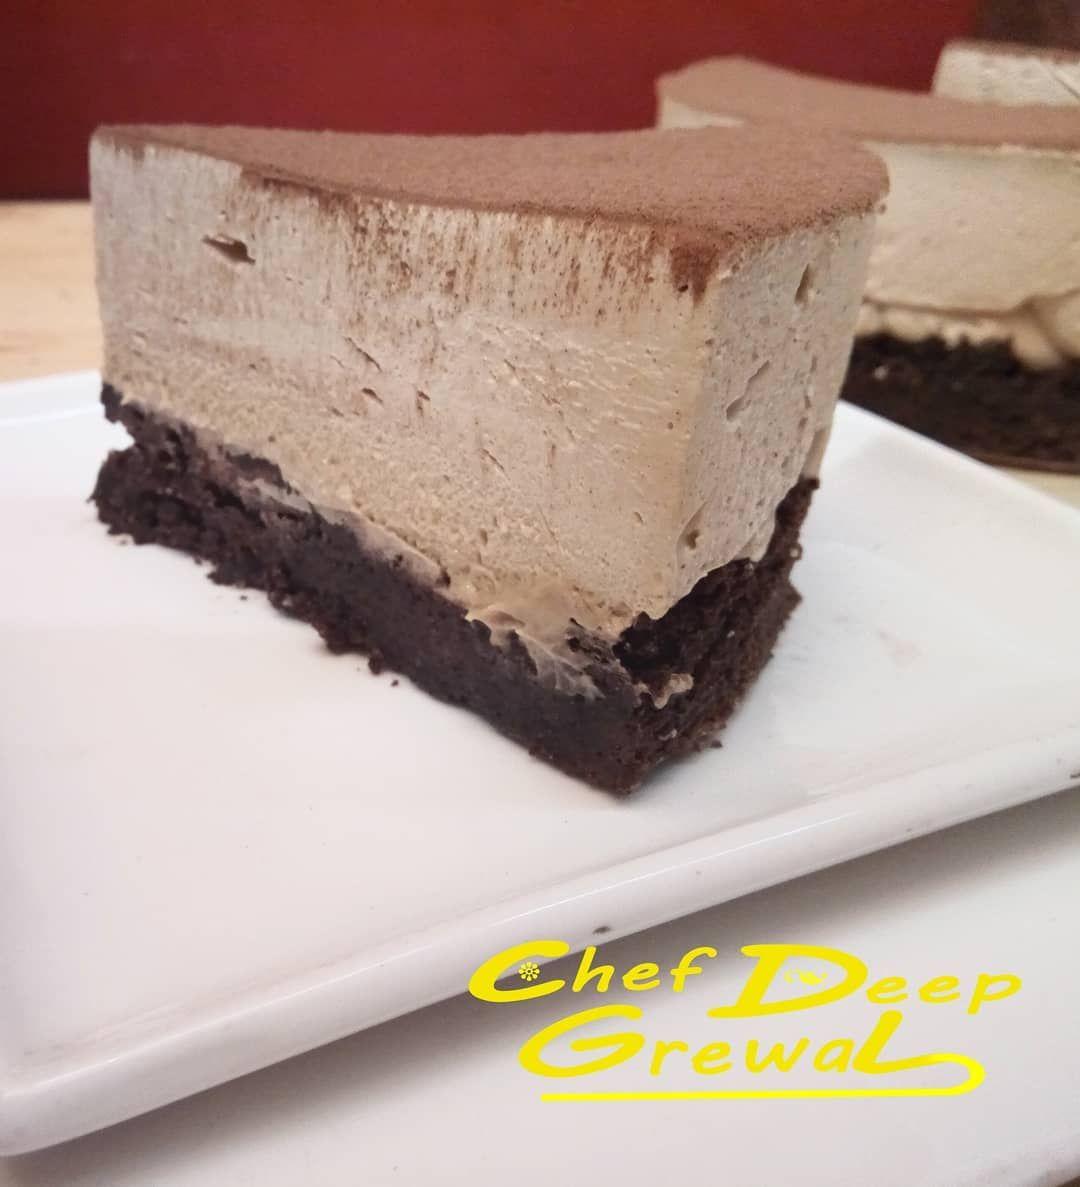 Chocolate ice Cream pastry...🧀🍫🍰🥧 #chocolatecake #chocolatelovers #chocolate #sugarlover #sugarfood #dessert #desserts #foodjunction #diettime #feeds #diet #foodblogfeed #foodforchildren&nbs